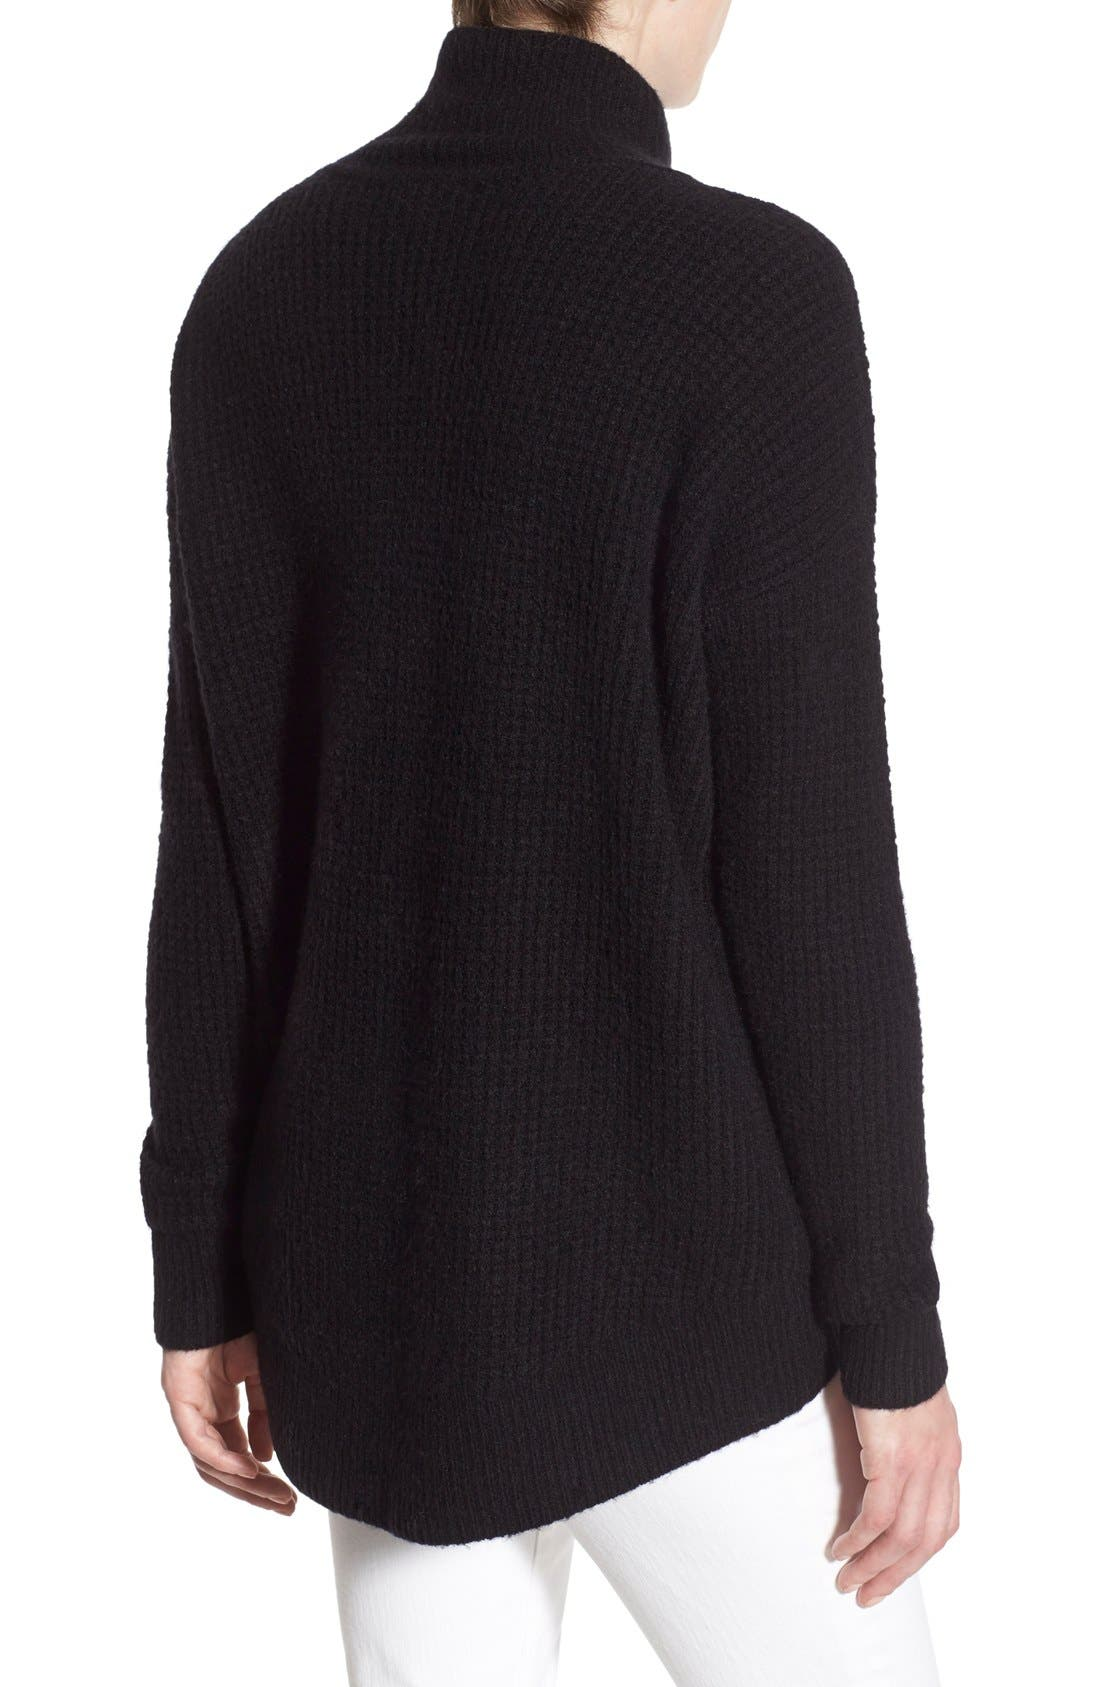 Wafflestitch Turtleneck Sweater,                             Alternate thumbnail 3, color,                             001